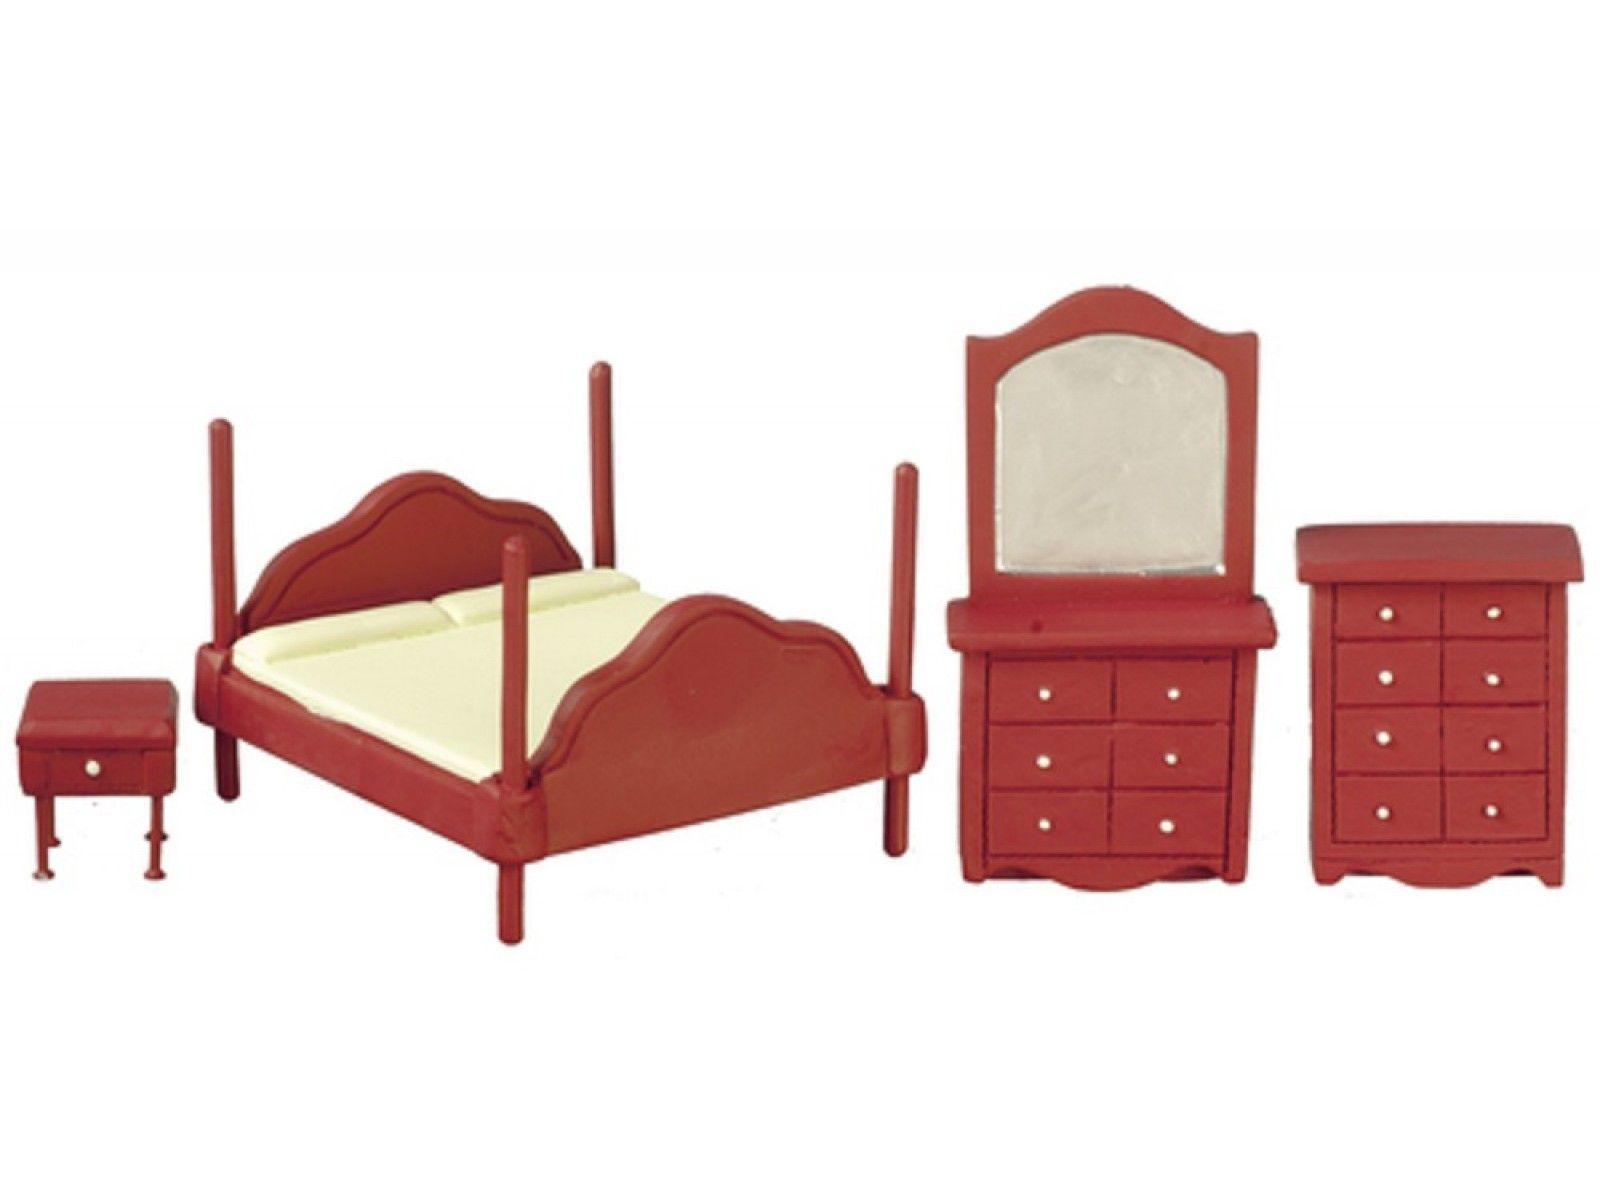 Dolls House Bedroom Furniture Set Suite 1:24 Half Inch Scale